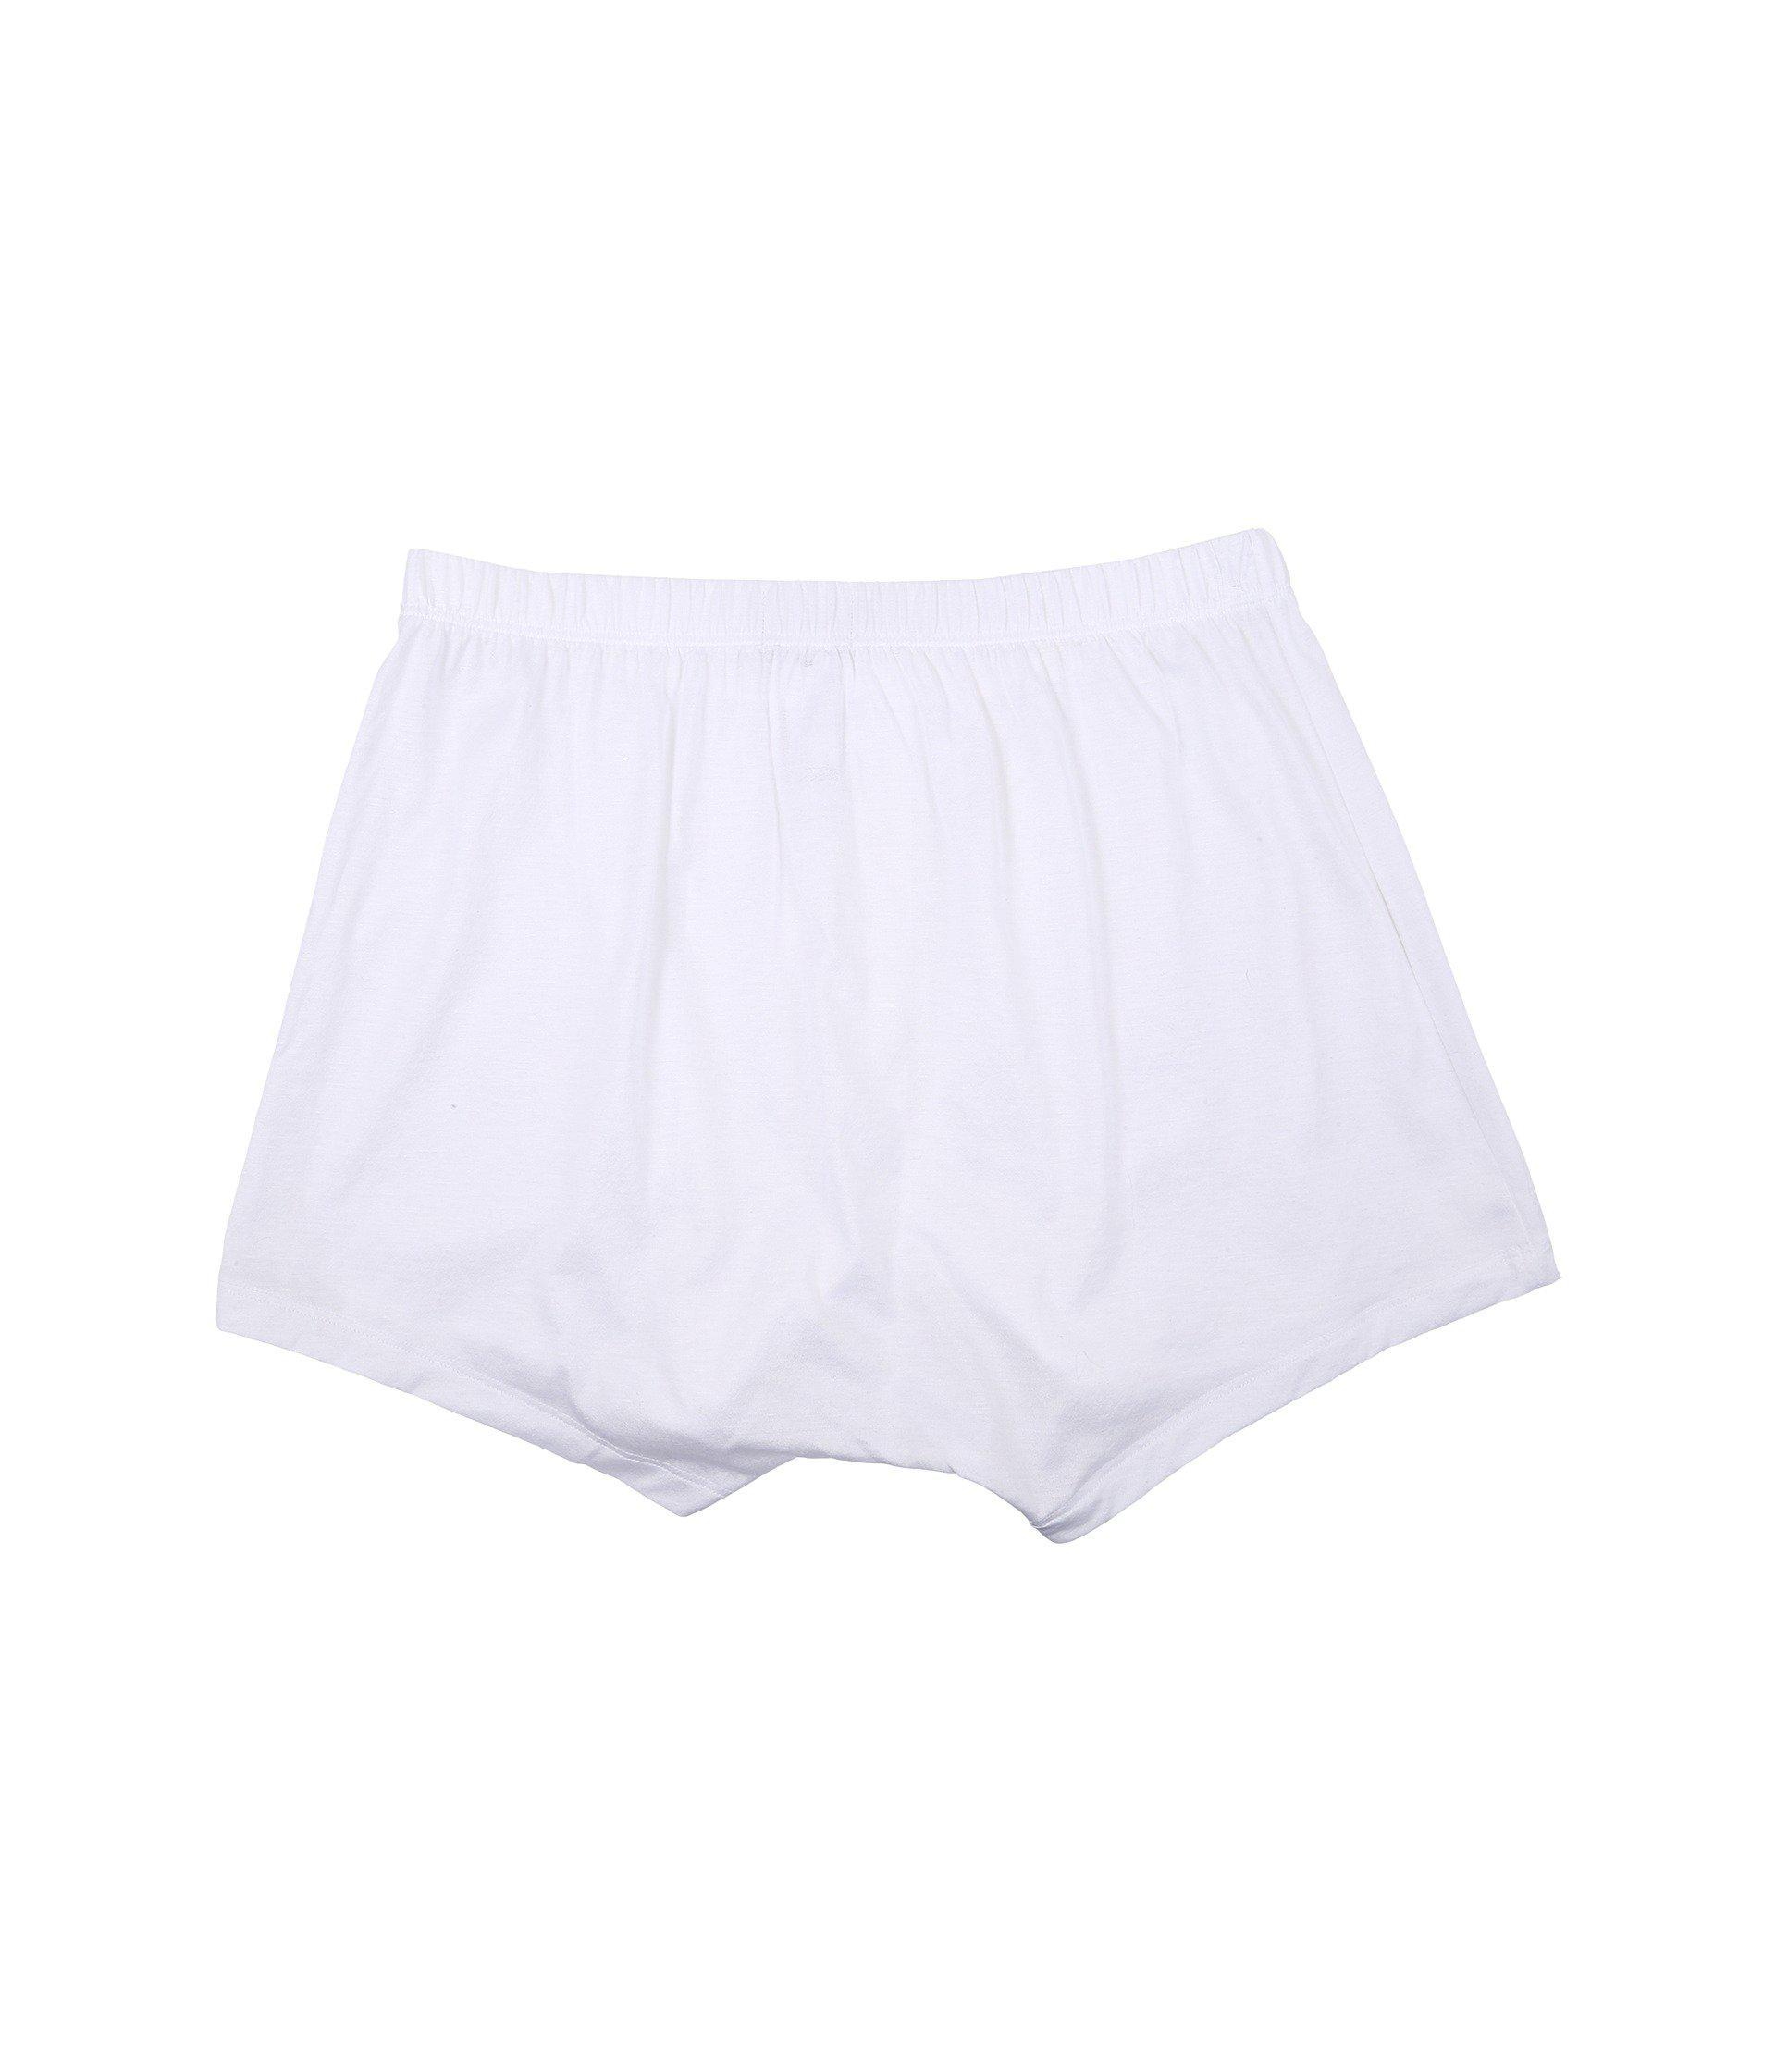 b65c35d2ec359 Lyst - Hanro Cotton Sporty Knit Boxer (midnight Navy) Men s ...